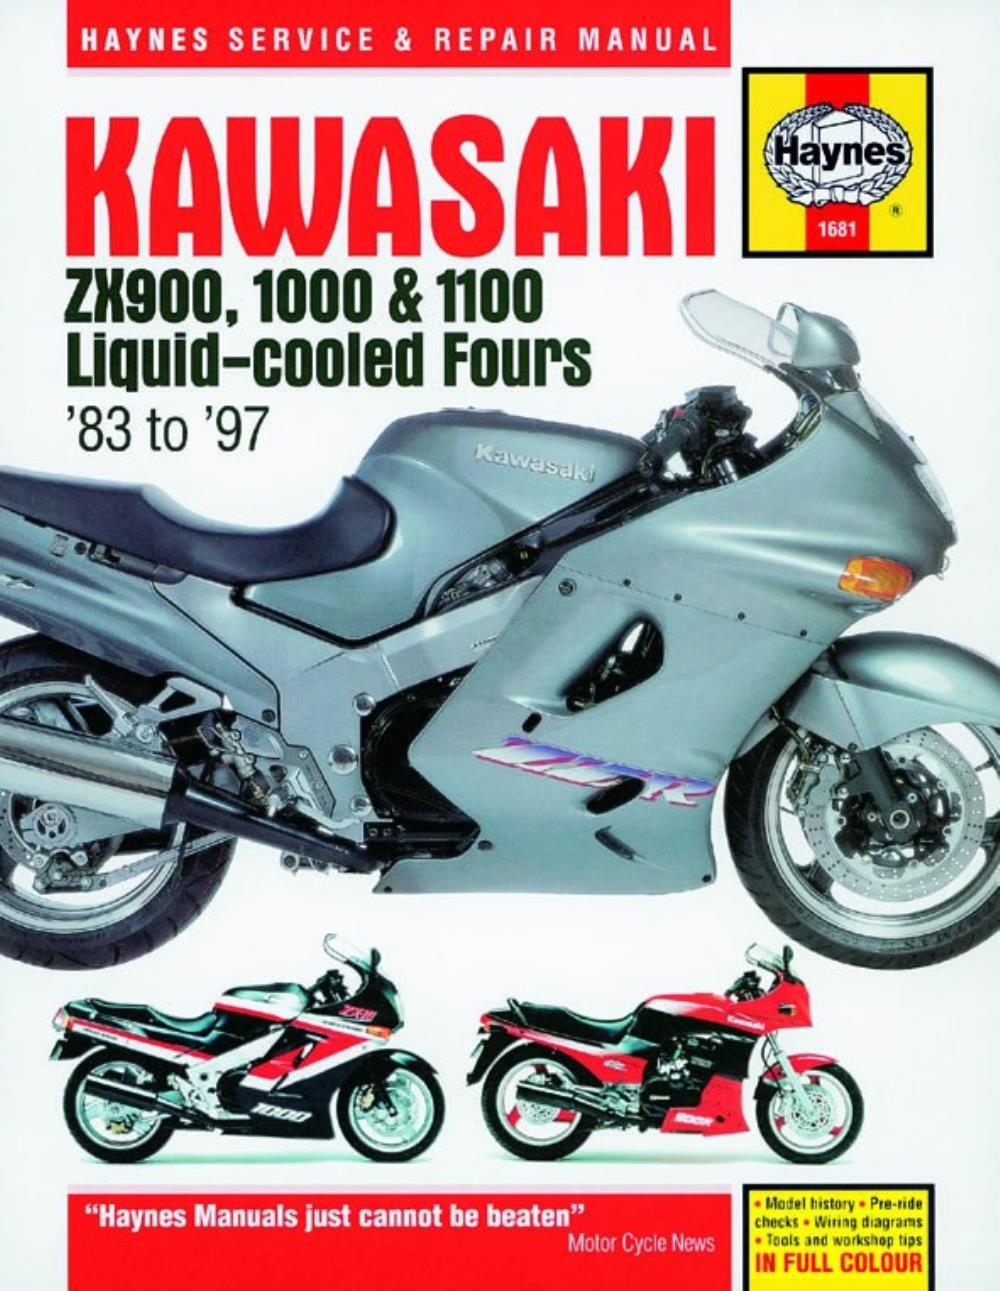 Manual Haynes for 2000 Kawasaki ZZR 1100 ZX1100D8